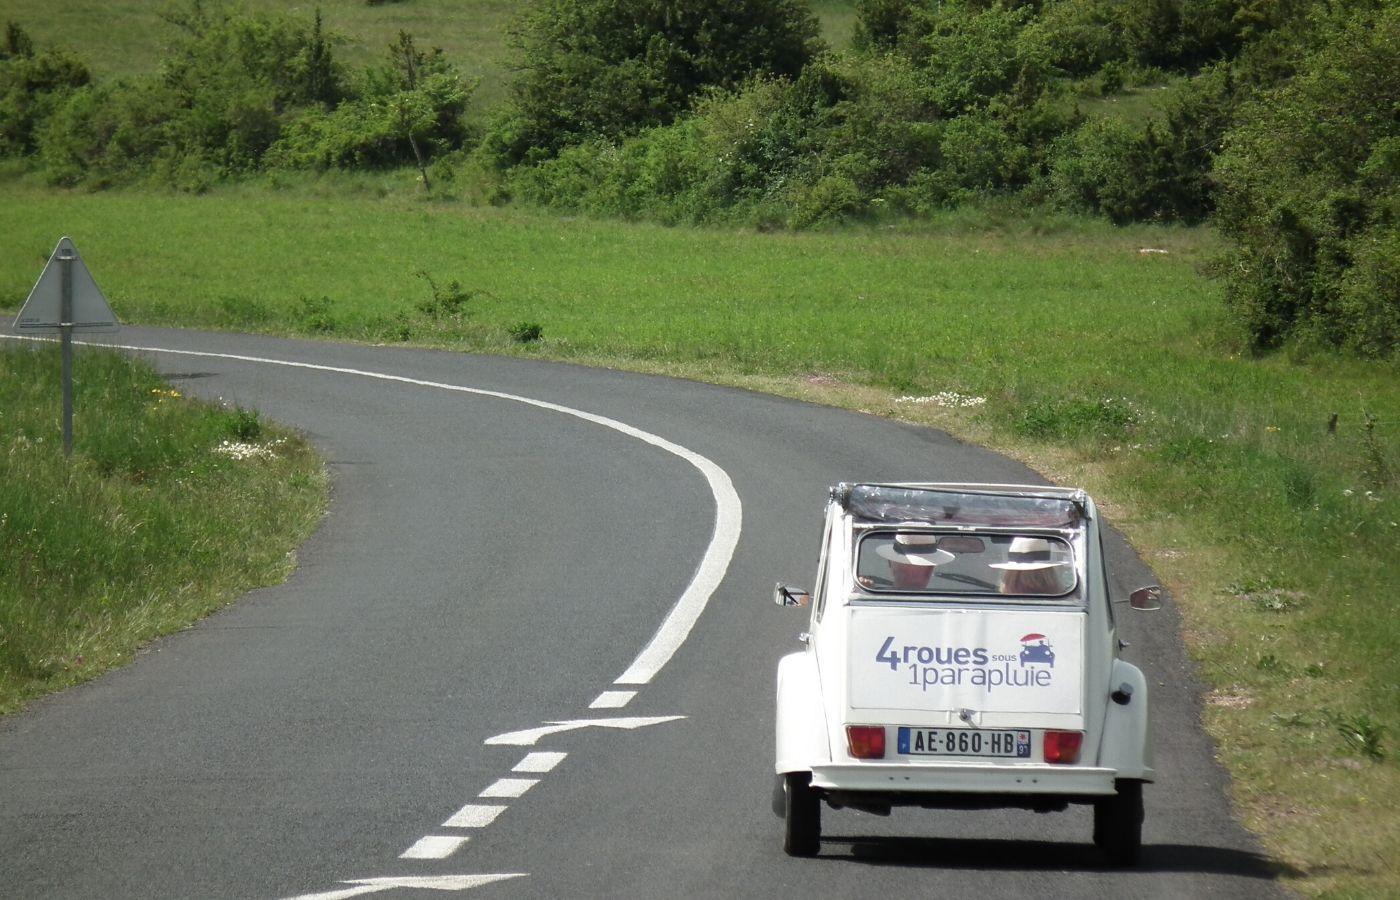 Rallye 2CV - Normandie - 4 roues sous 1 parapluie